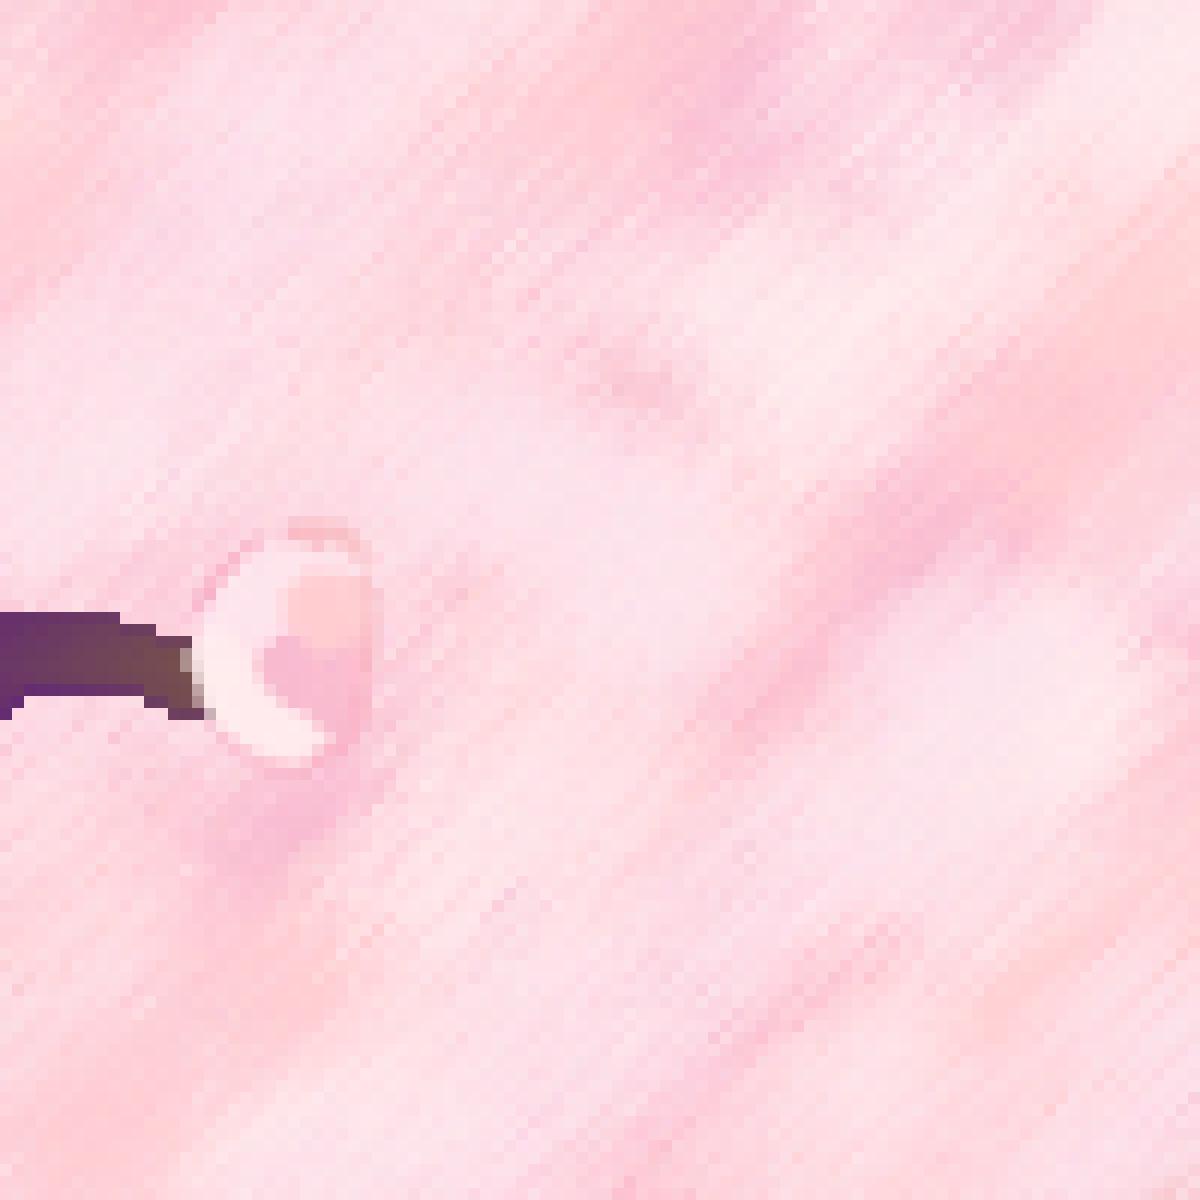 Cherry Blossoms by PrincessPika